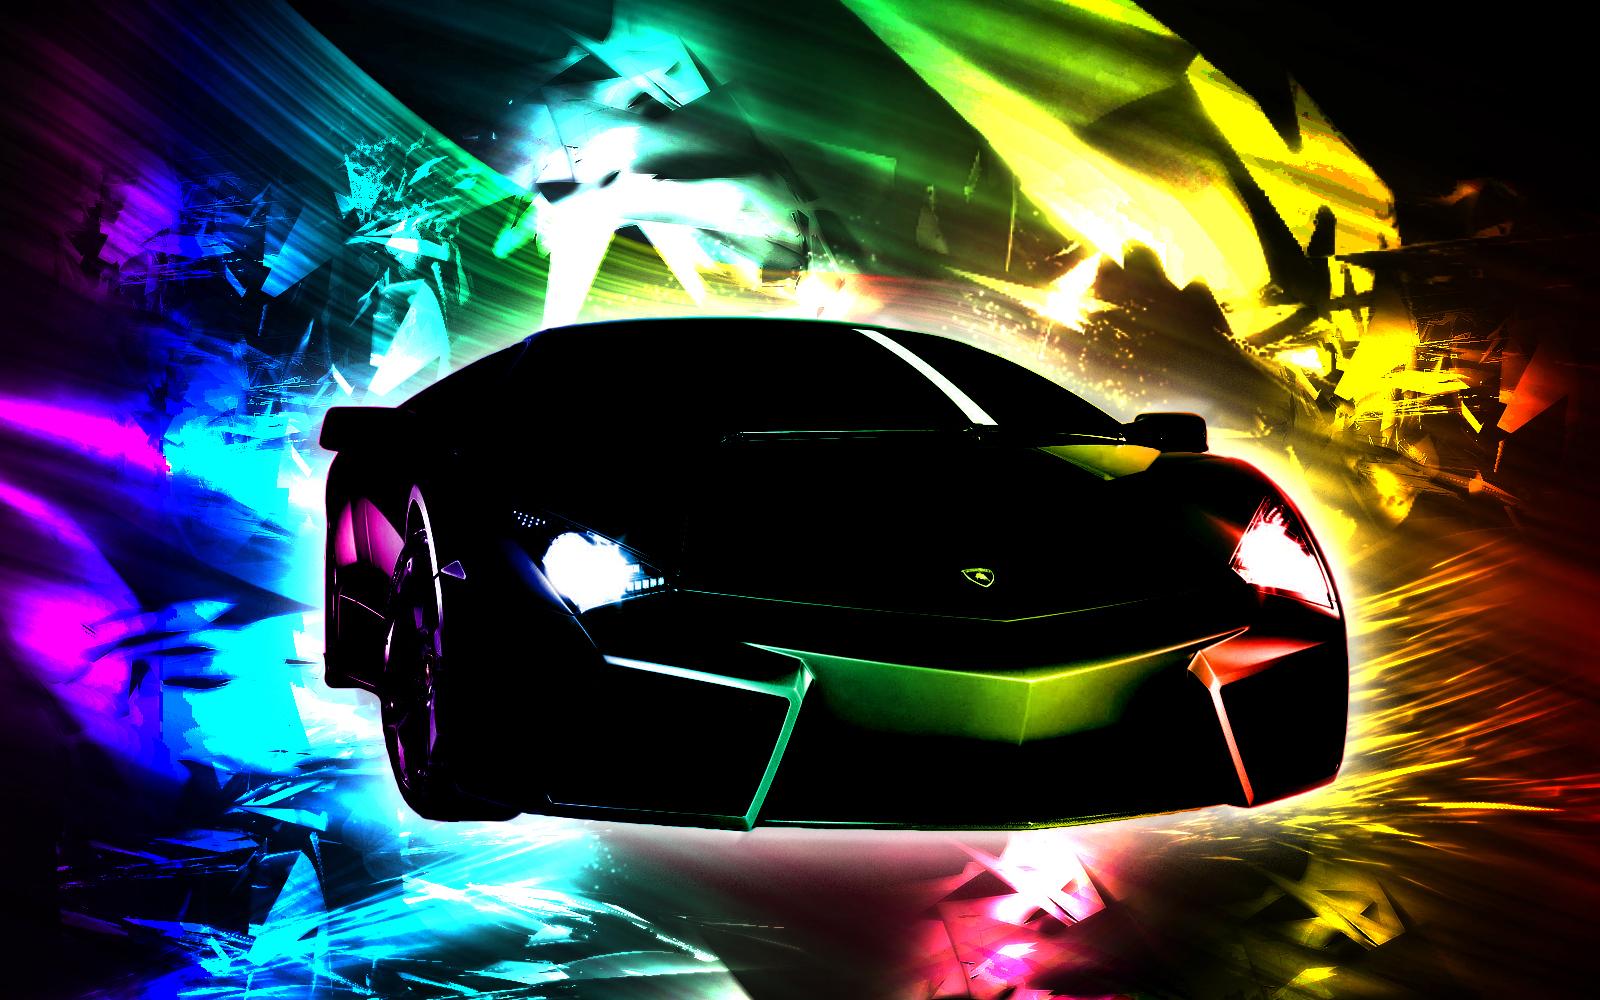 Lamborghini Reventon Hd Wallpaper Wallpapersafari